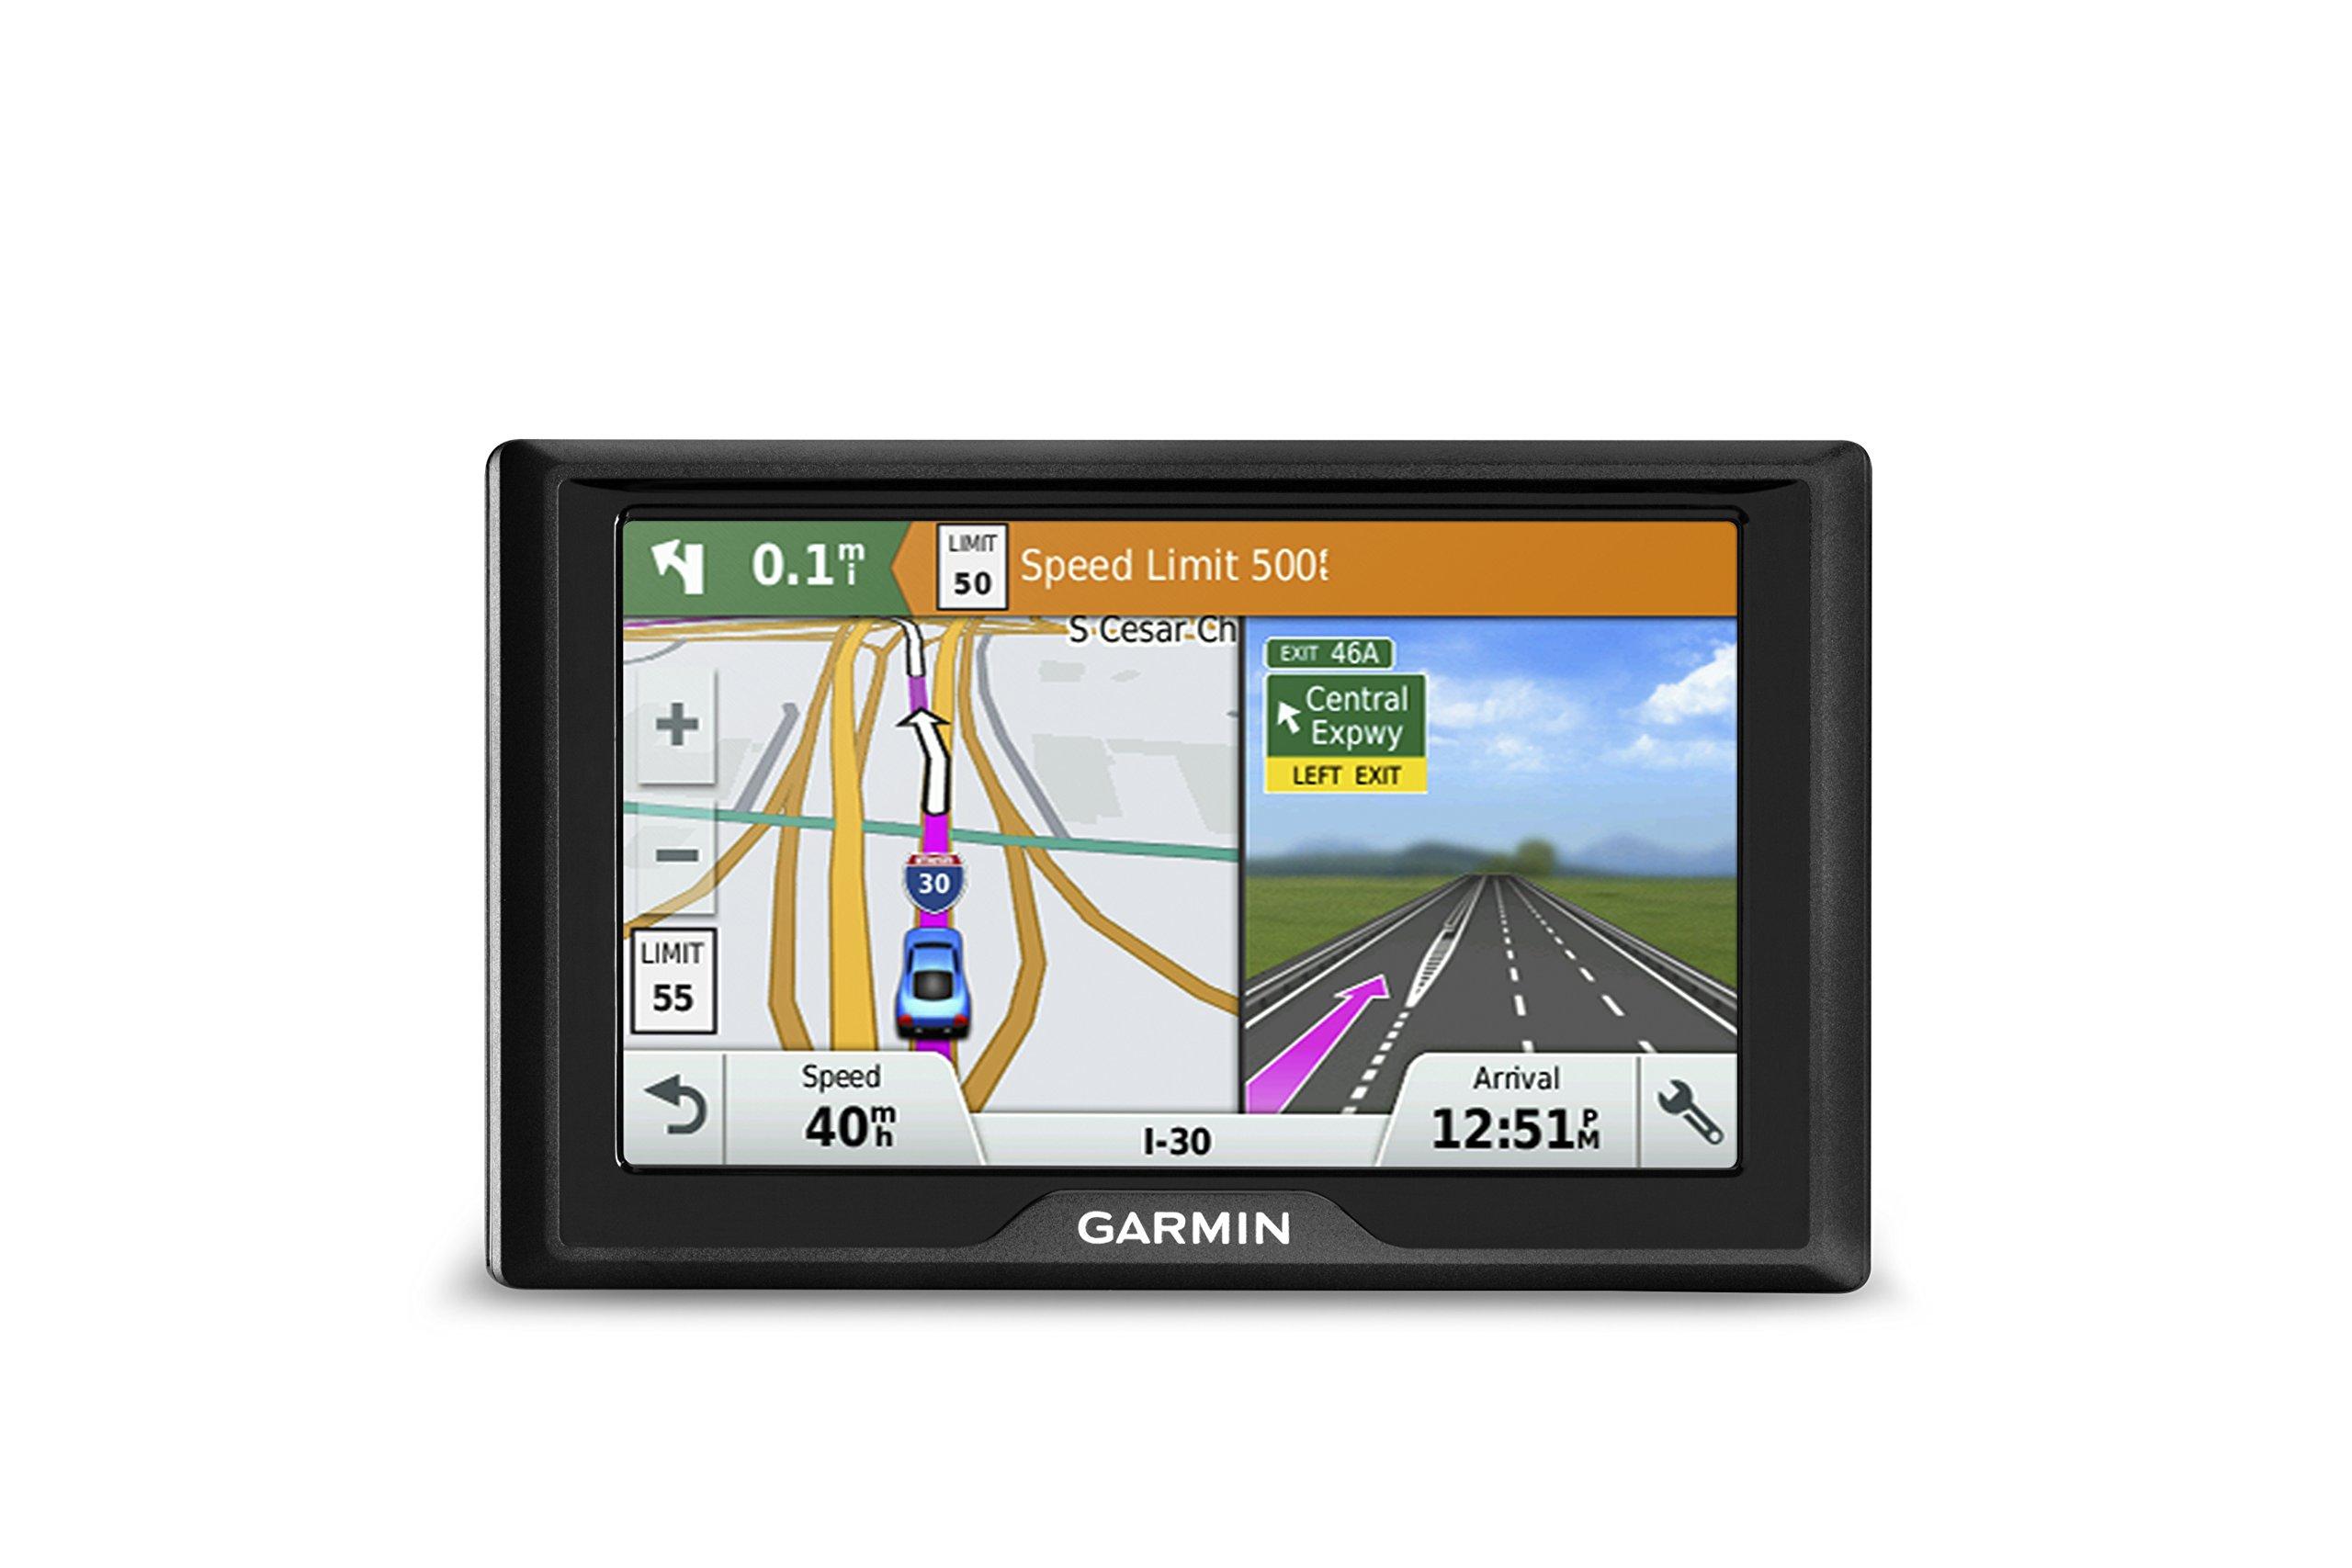 Garmin Drive 50 USA LM GPS Navigator System Lifetime Maps, Spoken Turn Turn Directions, Direct Access, Driver Alerts Foursquare Data